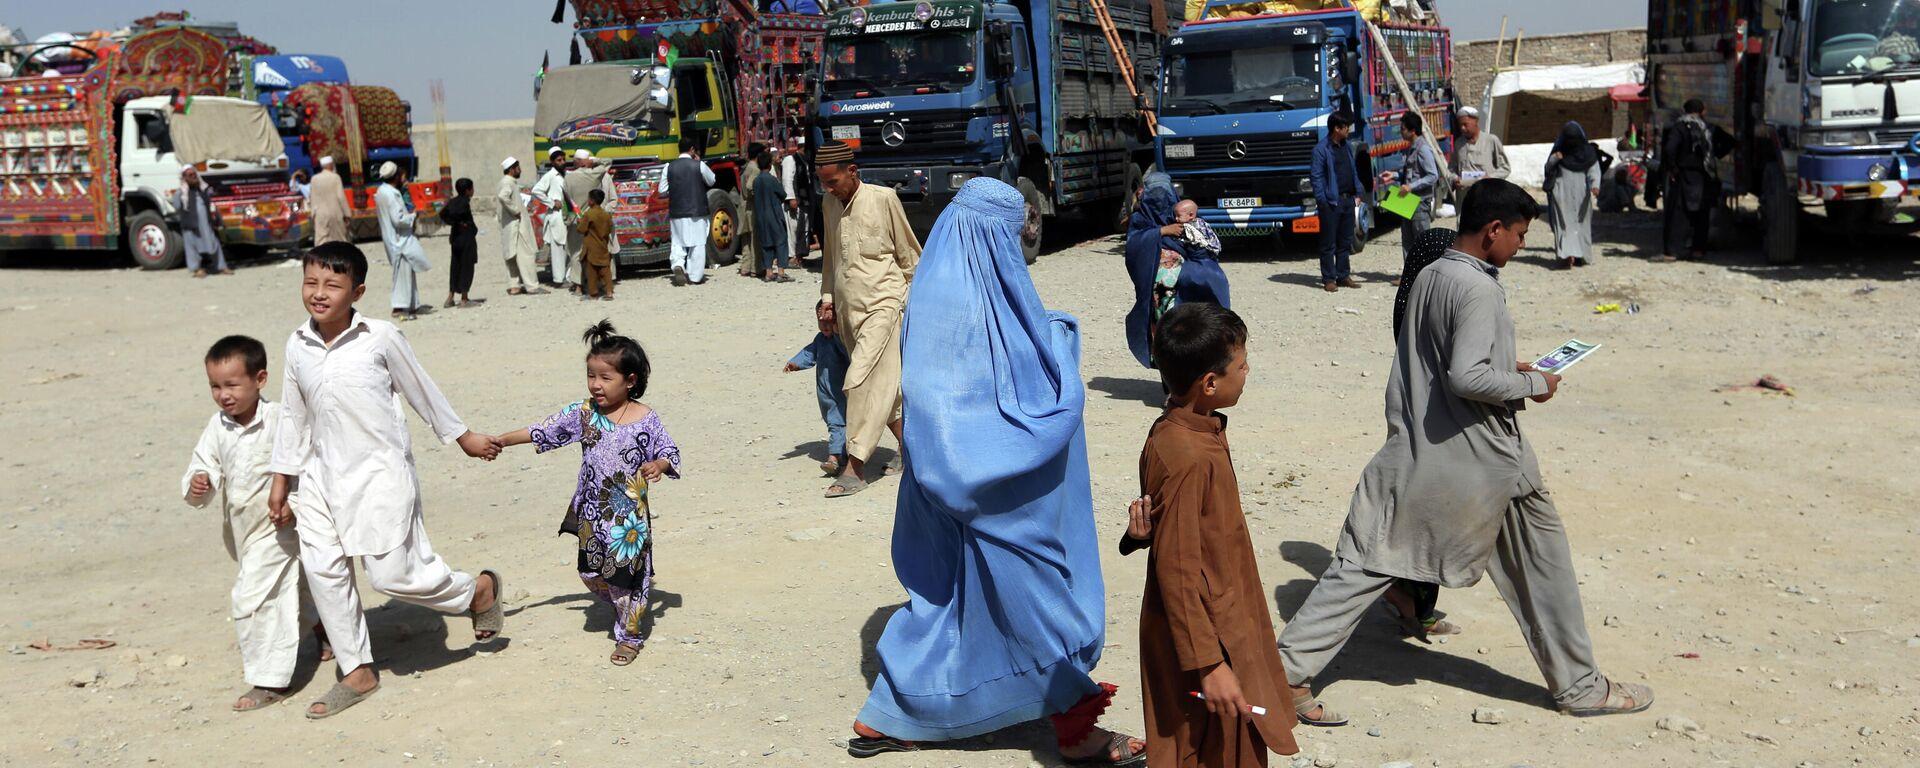 Афганские беженцы на окраине Кабула - Sputnik Таджикистан, 1920, 18.08.2021